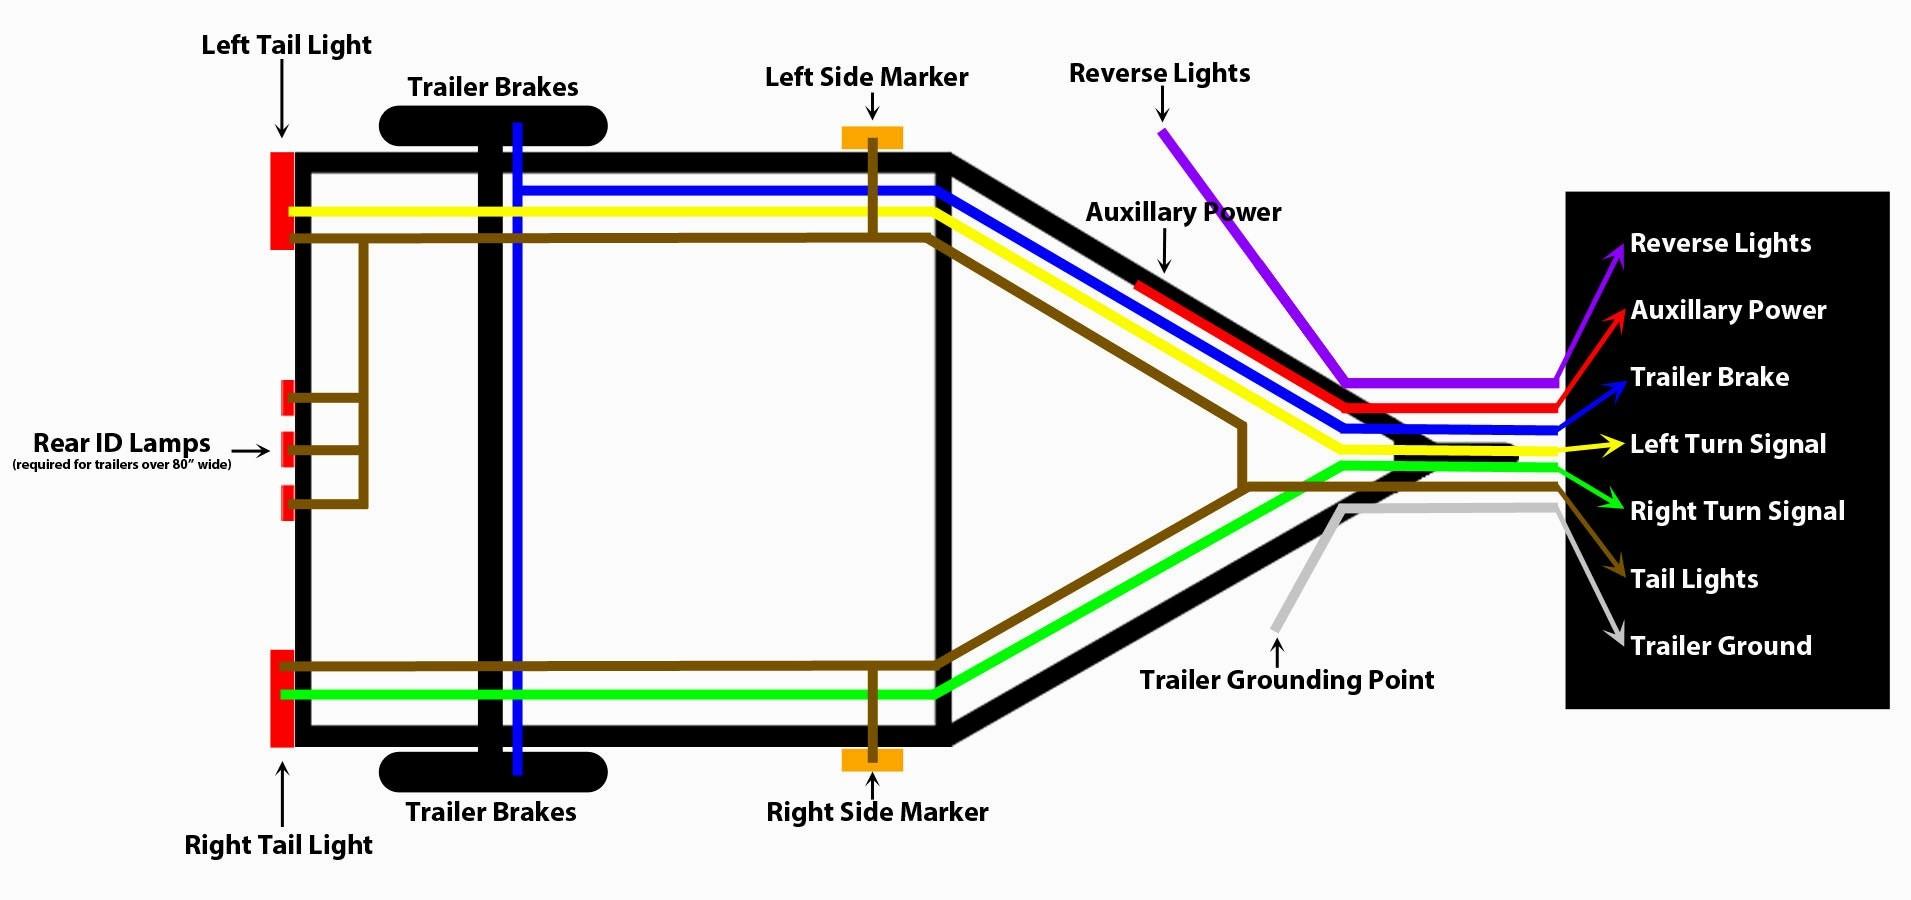 Featherlite Trailers Wiring Diagrams | Wiring Diagram - Horse Trailer Wiring Diagram